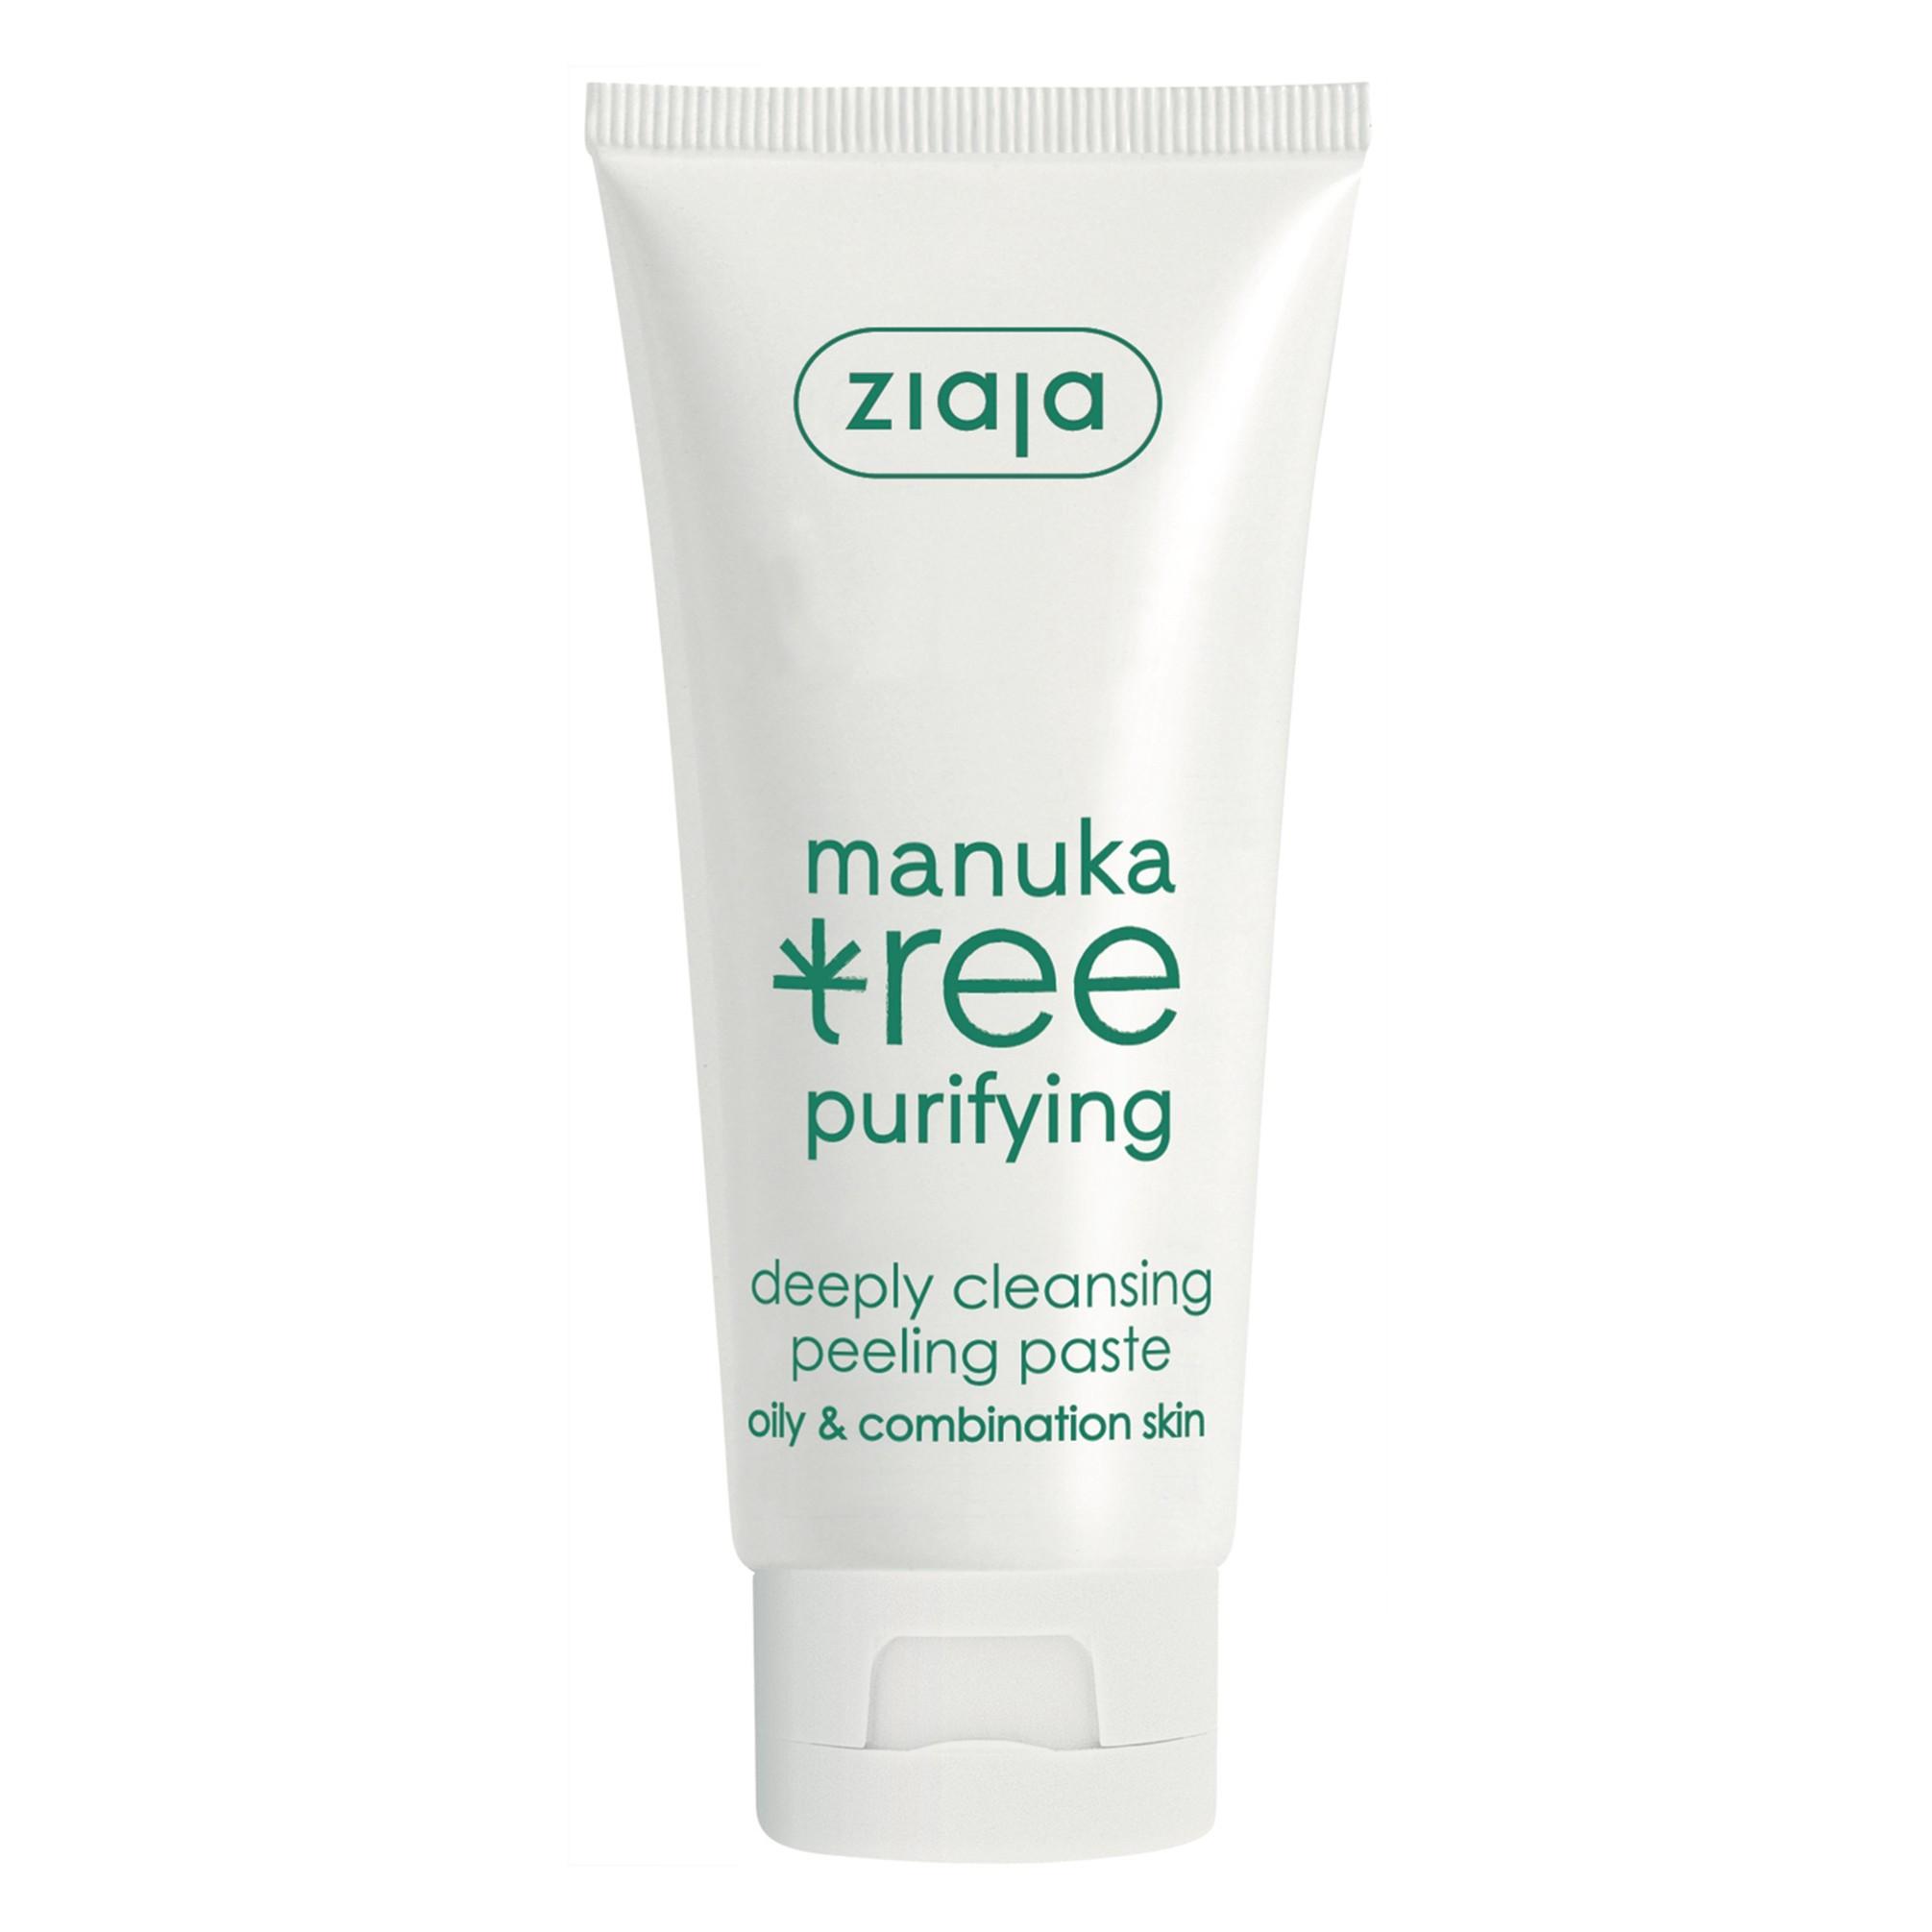 ЖАЯ Пилинг с екстракт от манука 75мл | ZIAJA Manuka tree peeling paste 75 ml